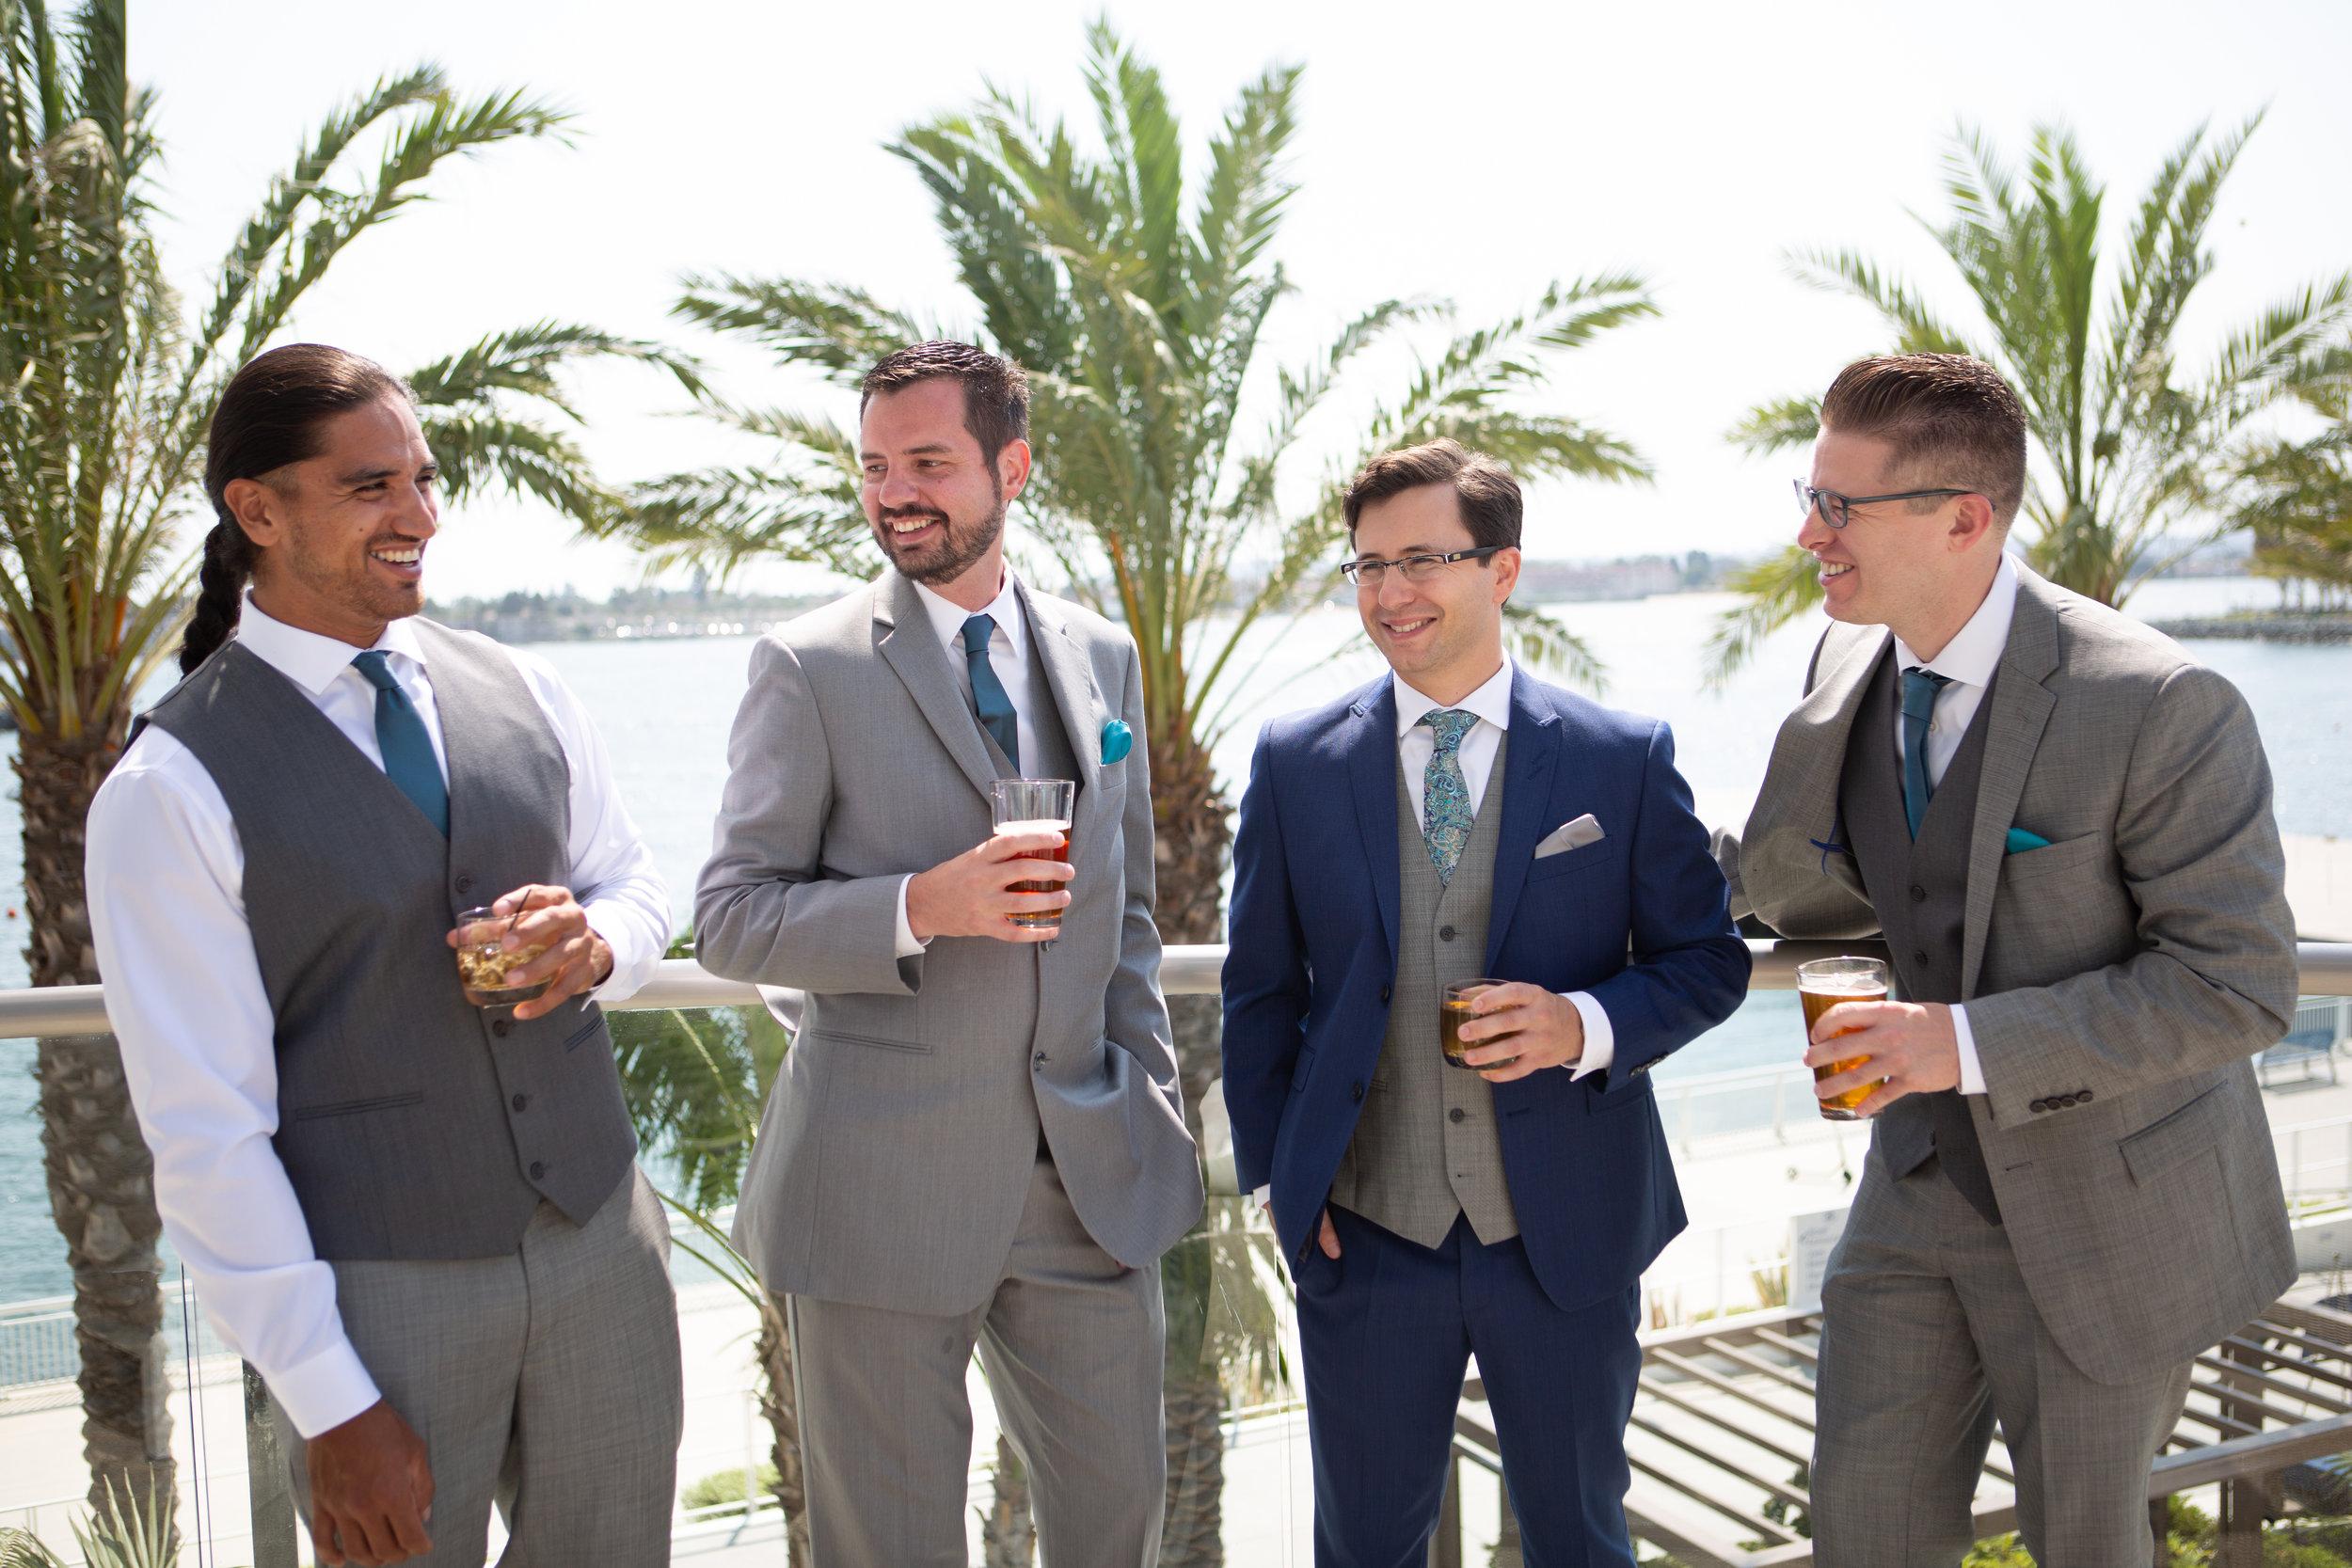 San-Diego-Wedding-Japanese-Friendship-Garden-Carla-David-2018-61.jpg